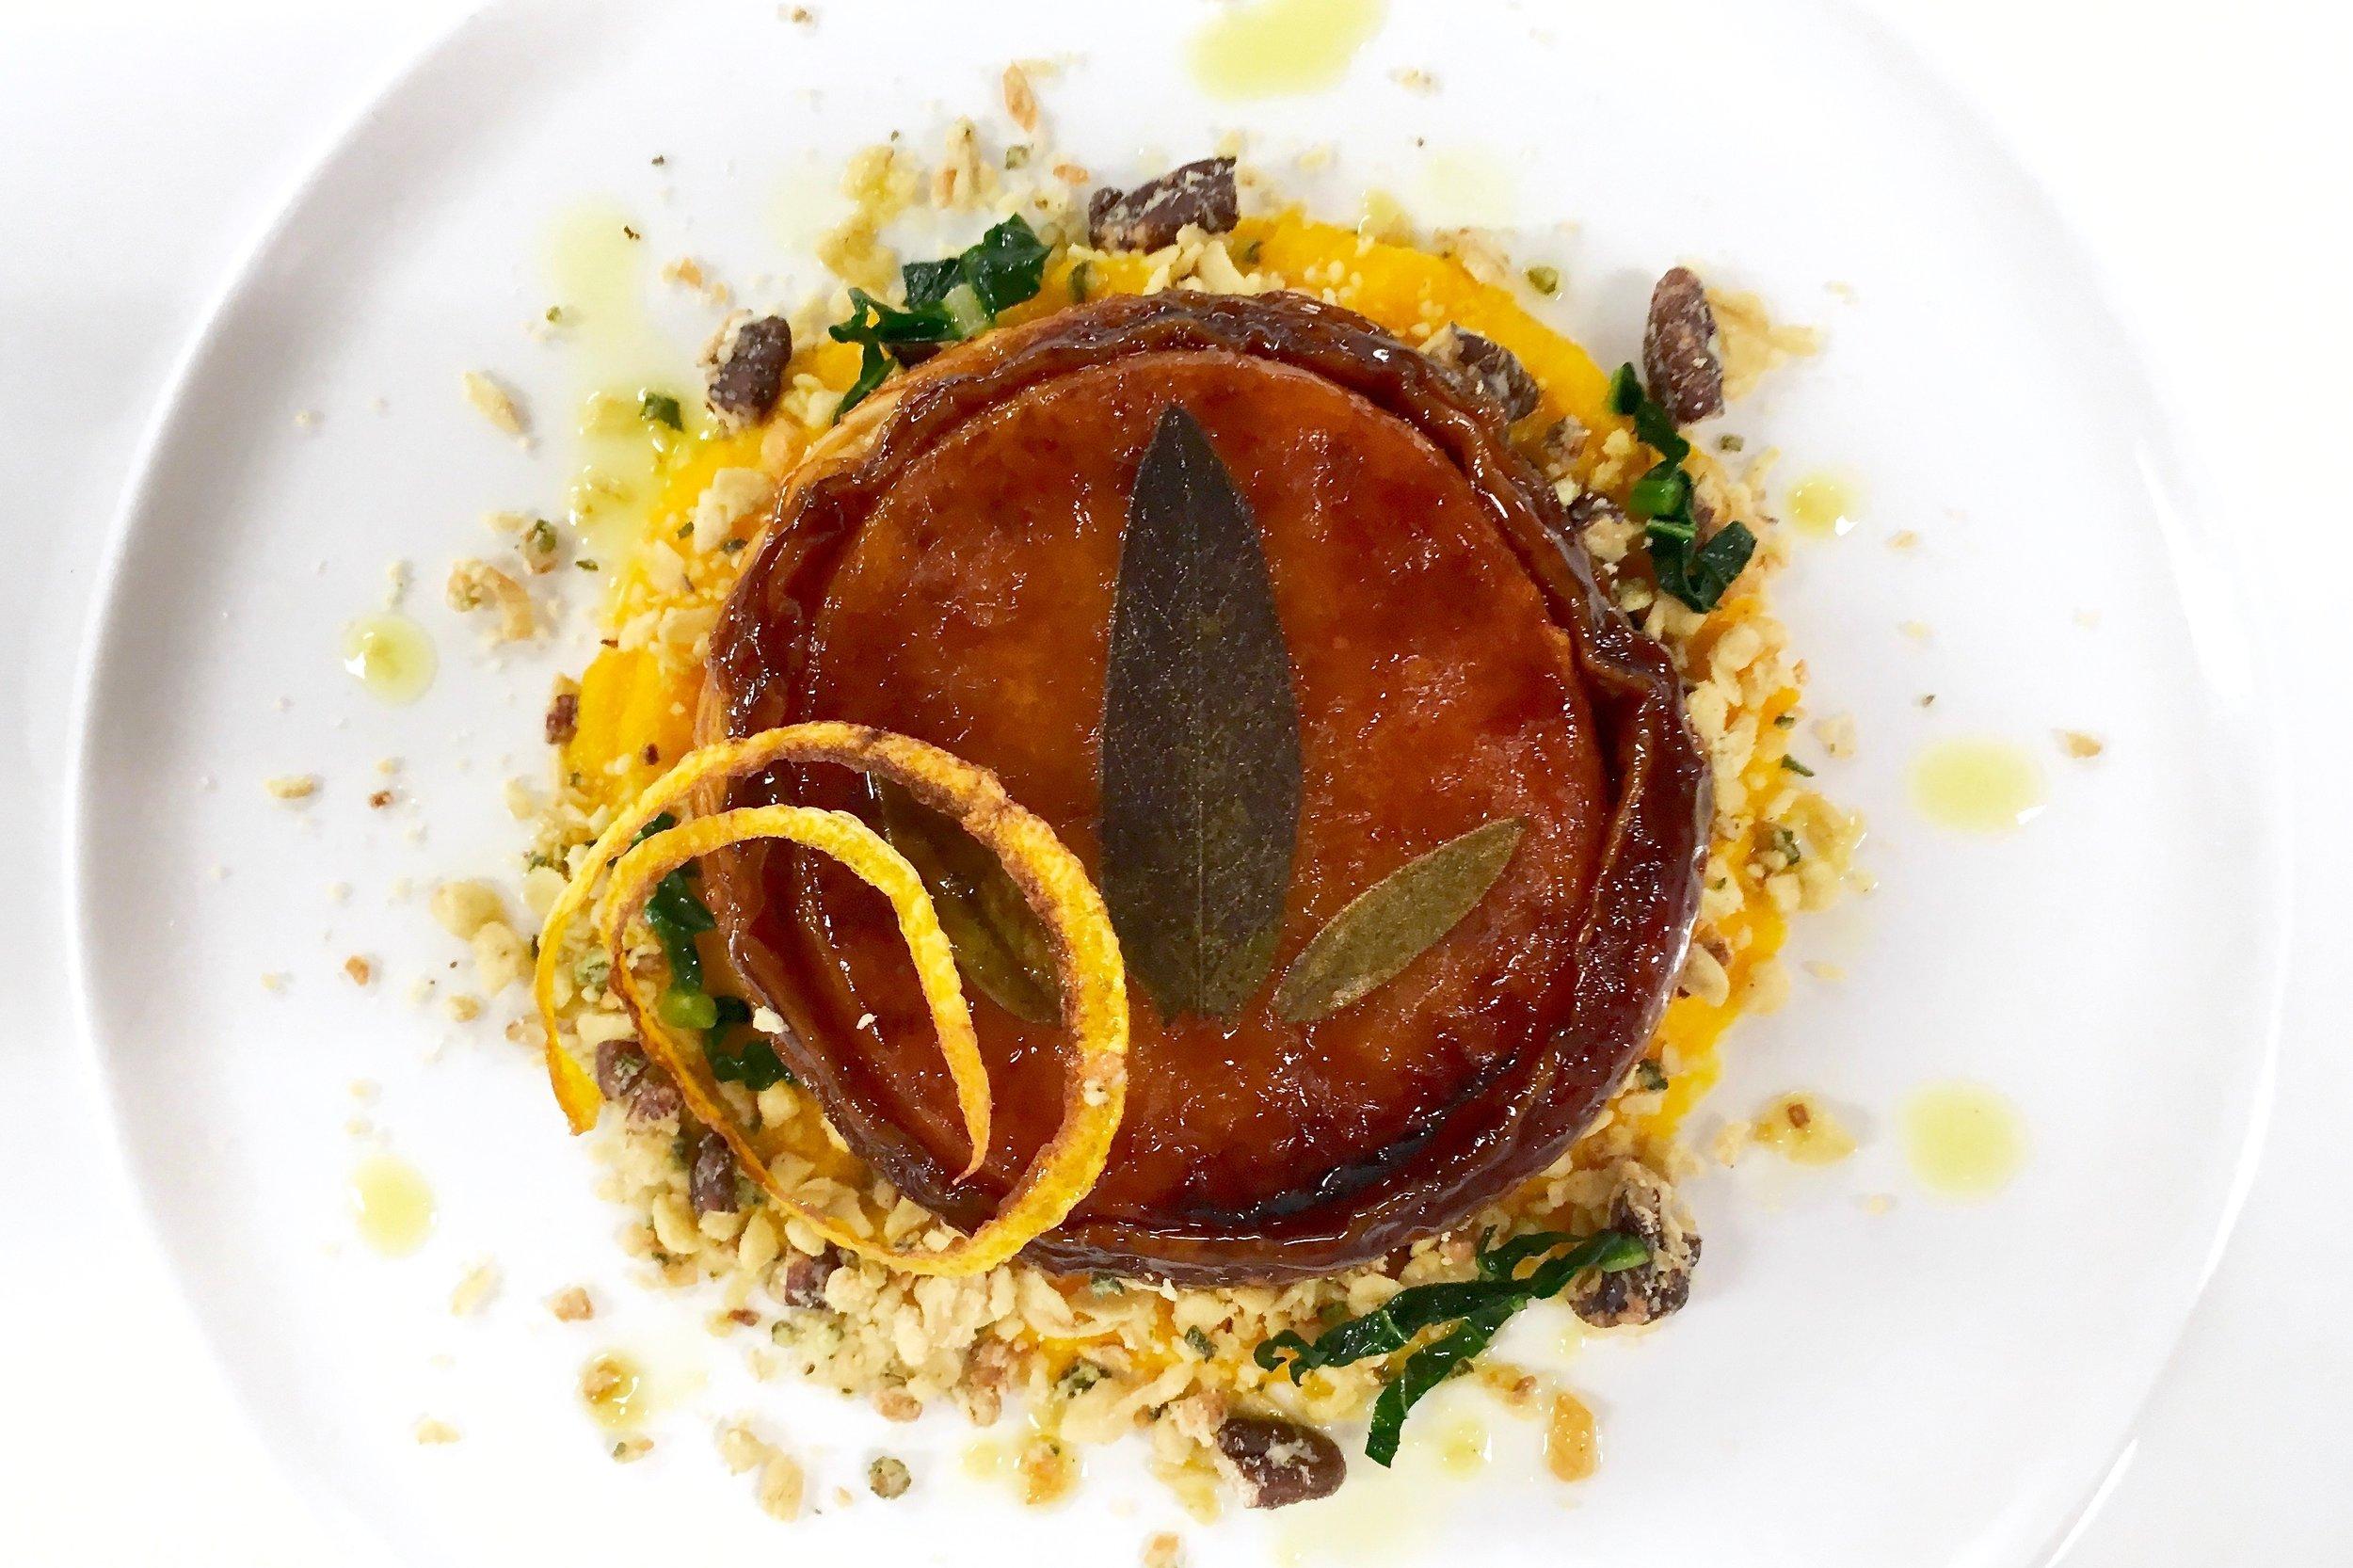 Butternut squash tarte tatin with sage and walnut crumble